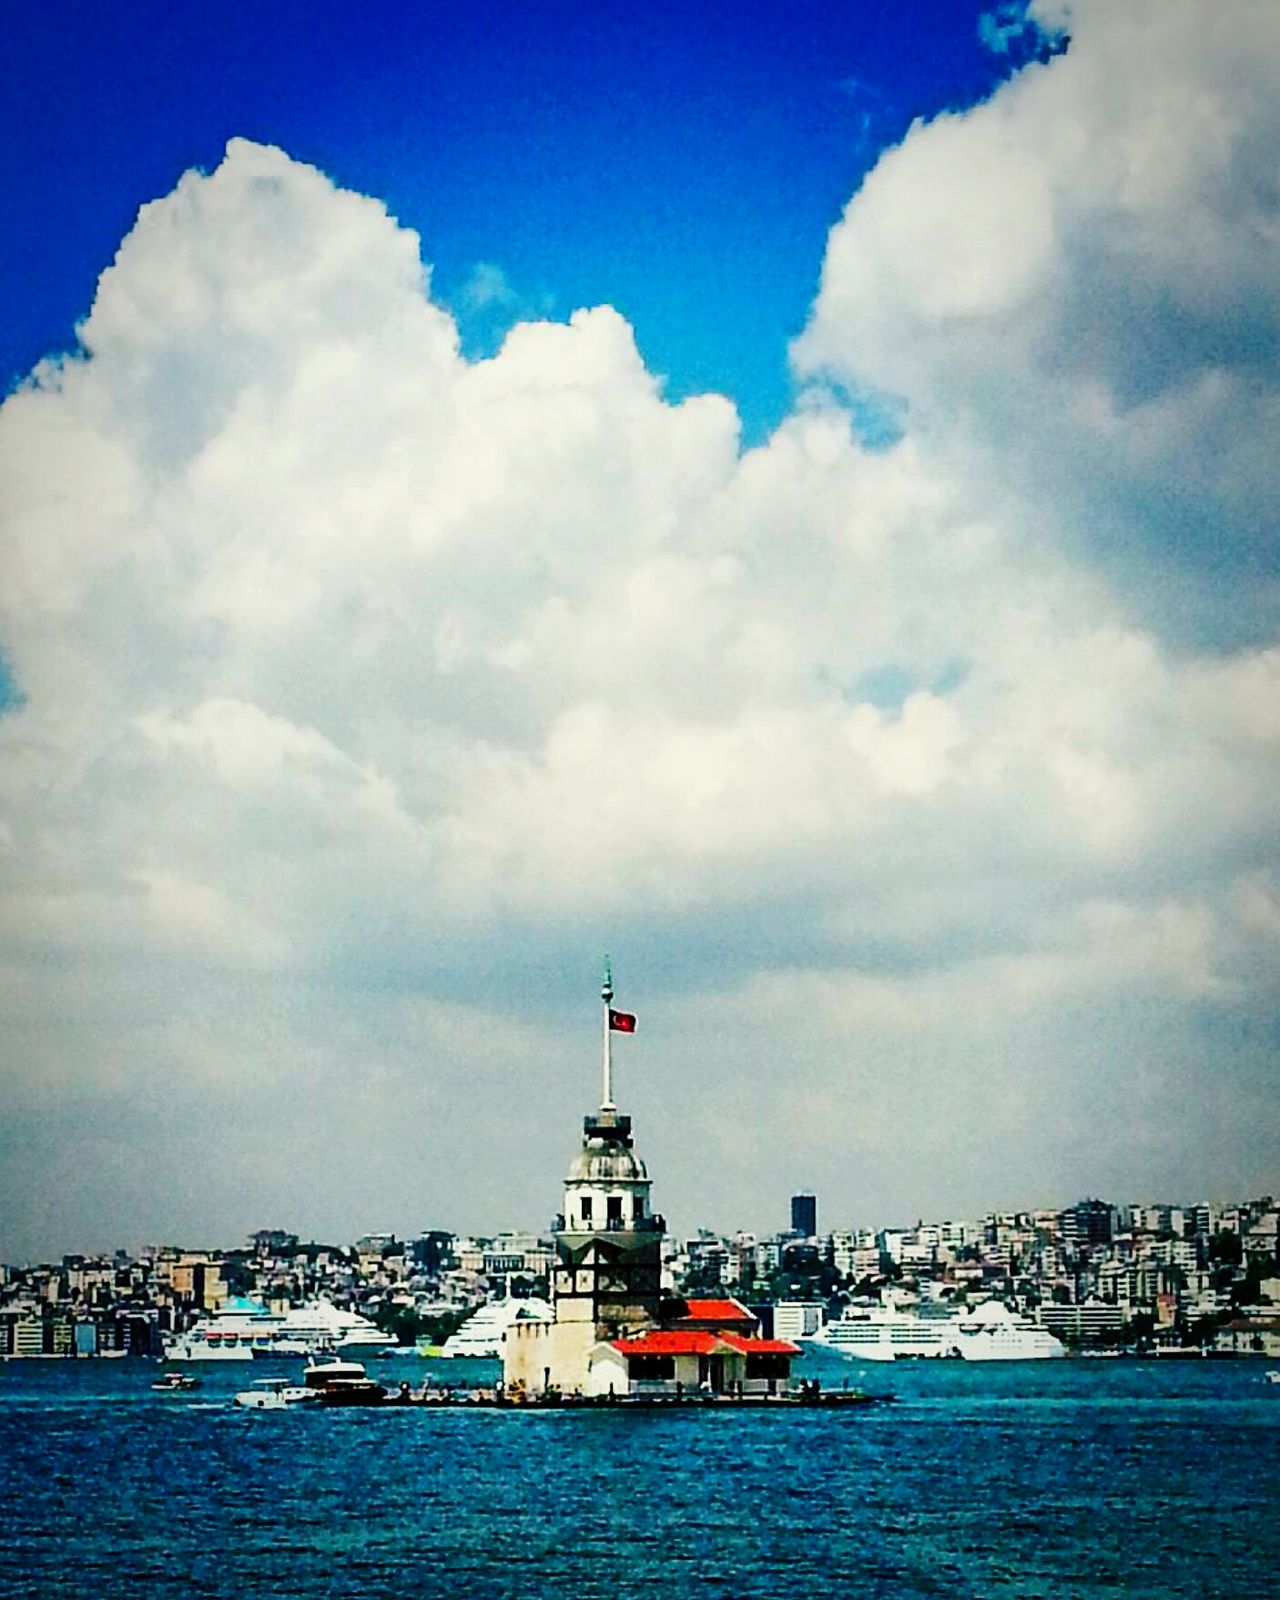 Kizkulesi PhotoByMuratGul Istanbul Turkey Bosphorus